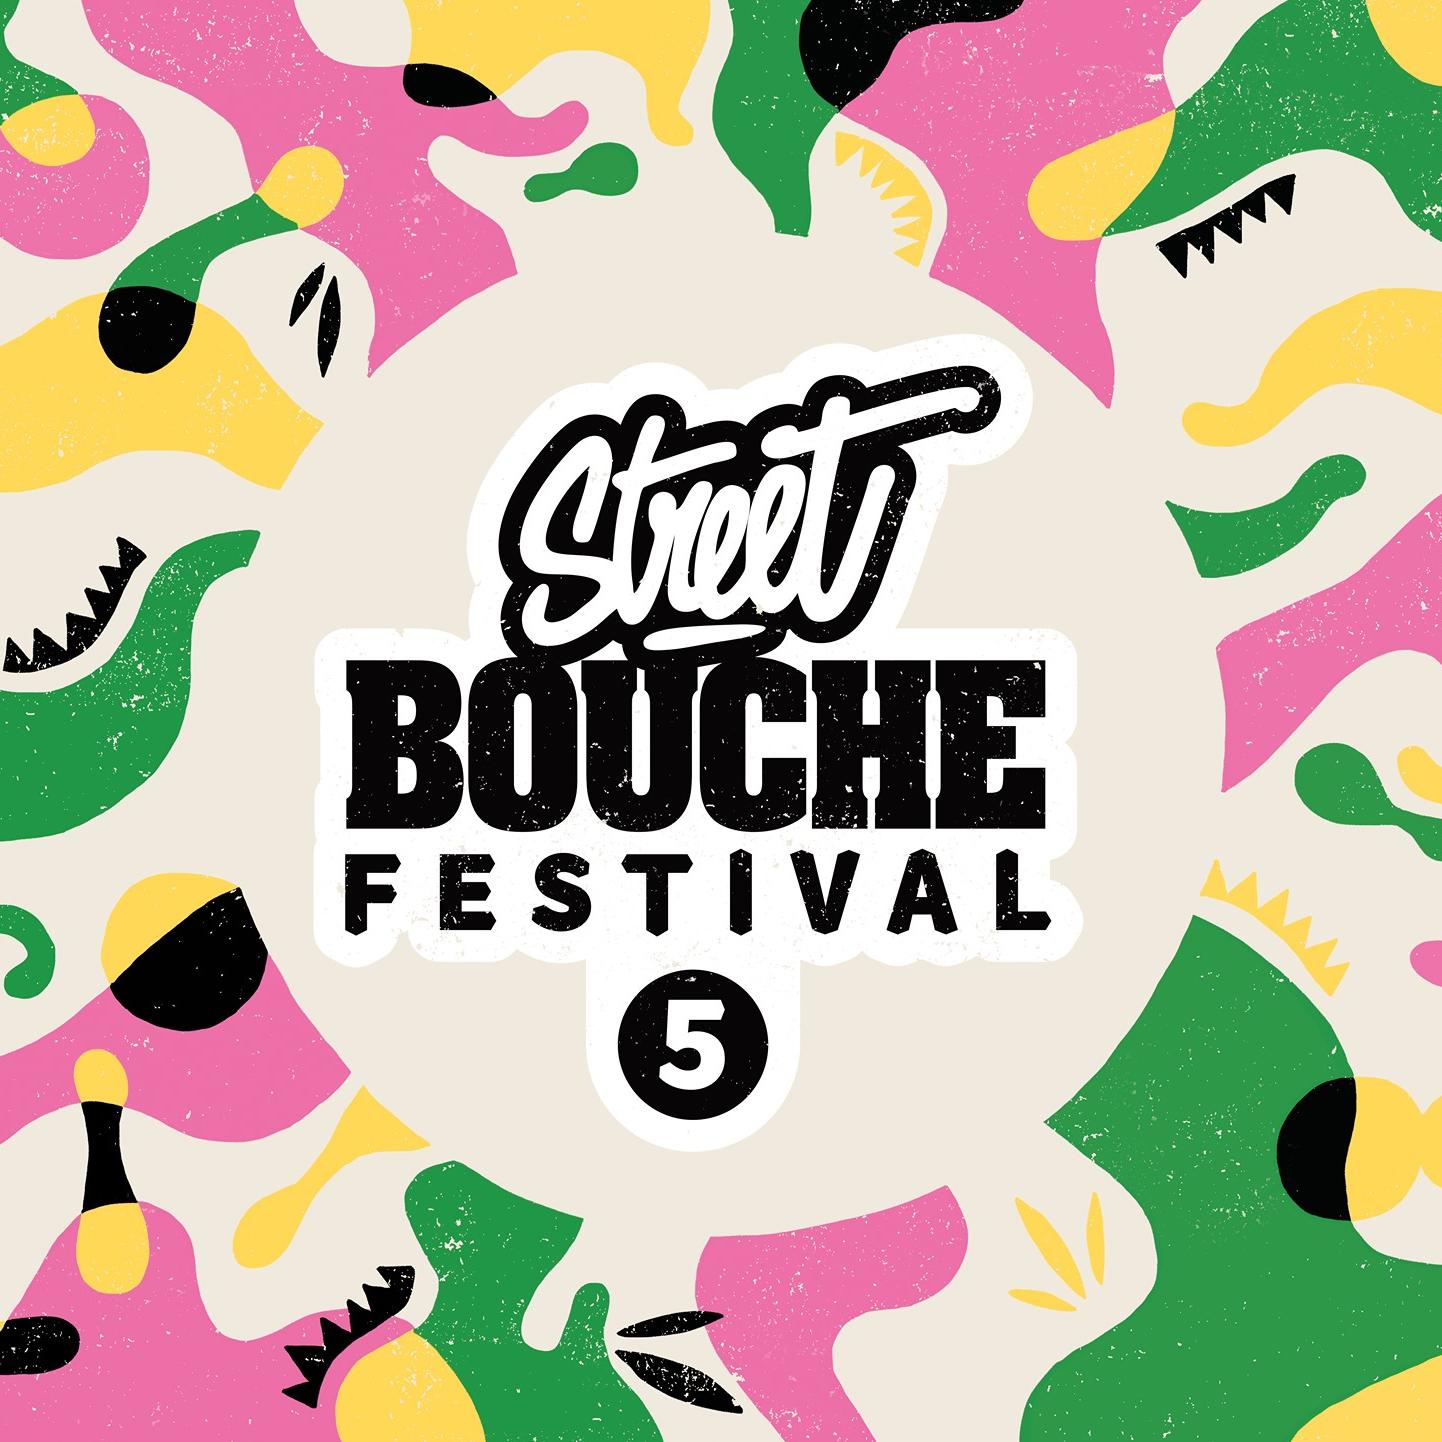 street bouche festival 5 strasbourg 2020 PMC square - Street Bouche